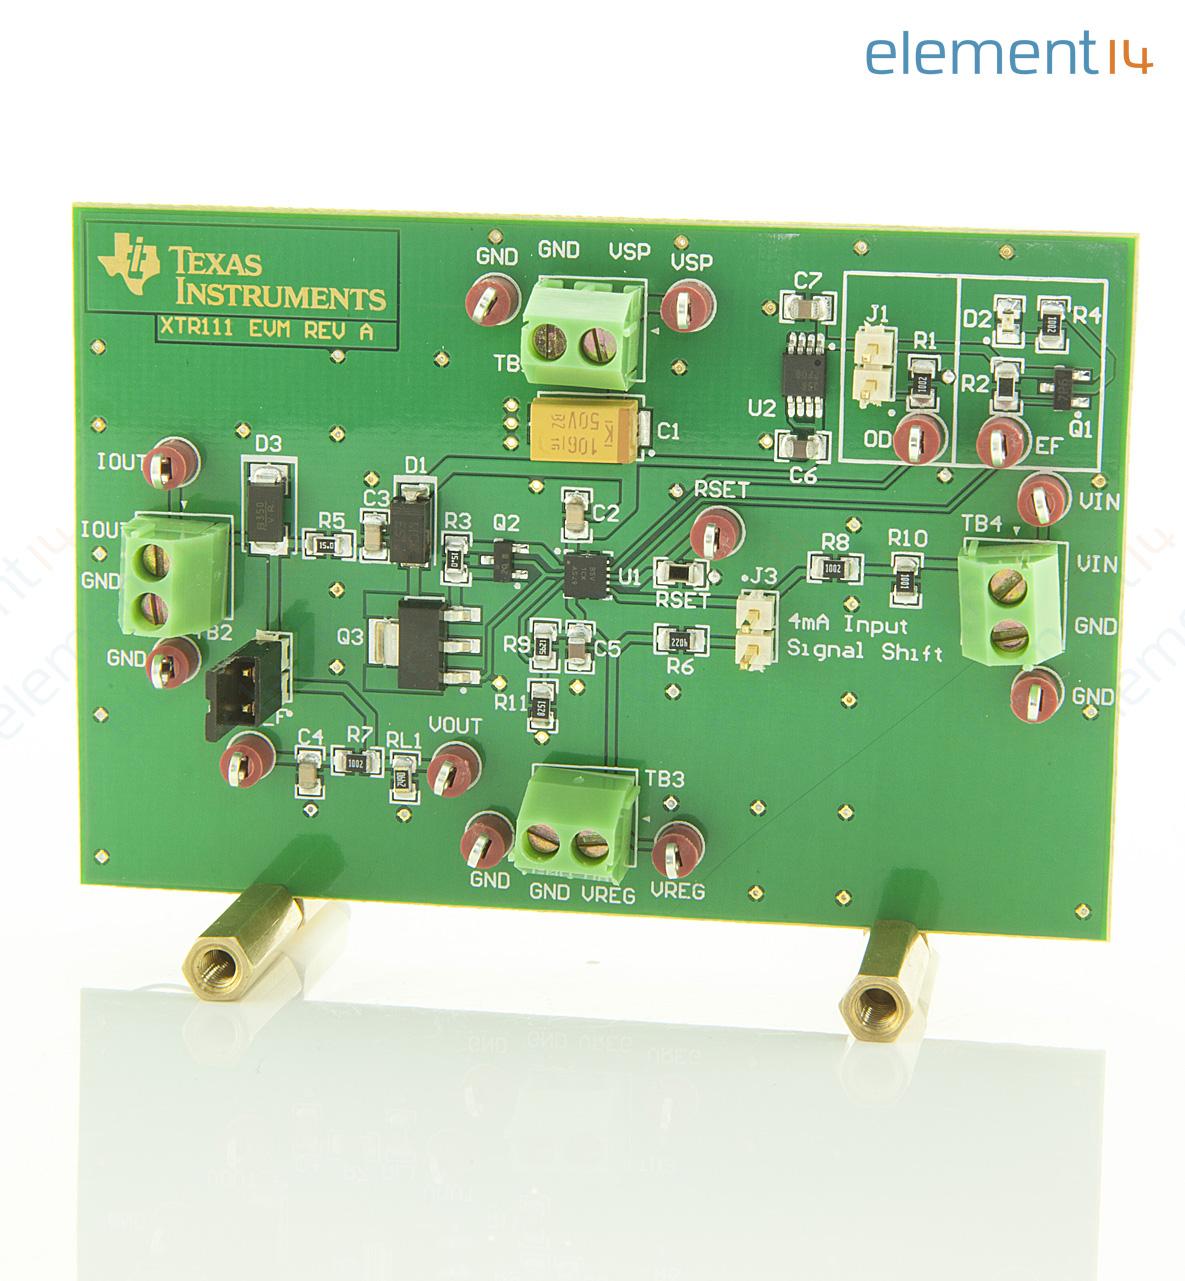 xtr111 2evm texas instruments evaluationsmodul spannungs strom wandler transmitter hohe. Black Bedroom Furniture Sets. Home Design Ideas